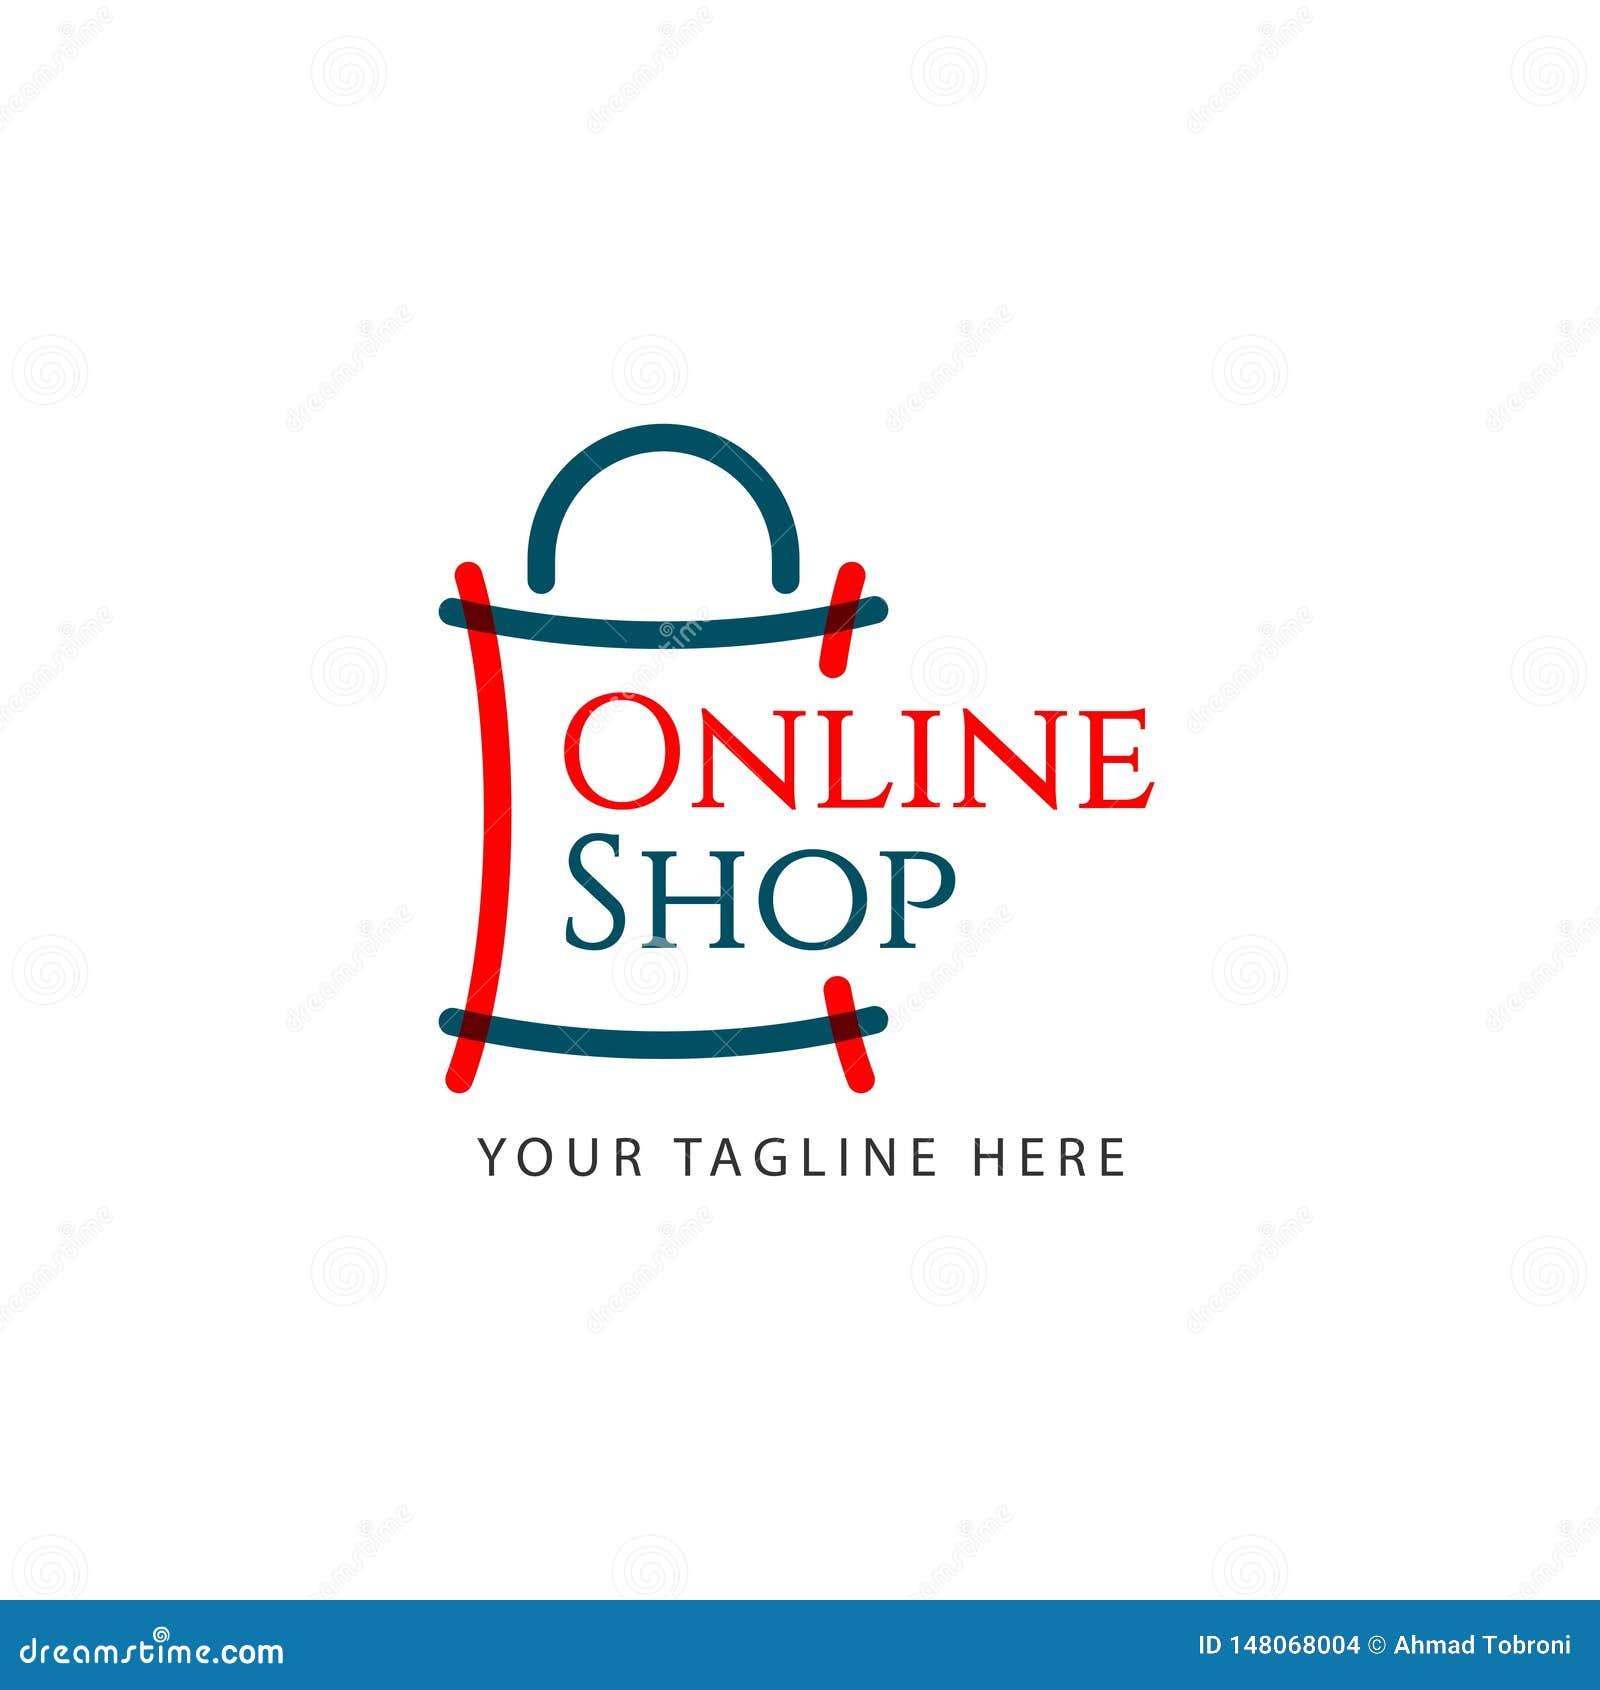 Online Shop Logo Vector Template Design Illustration Stock Vector Illustration Of Flat Business 148068004